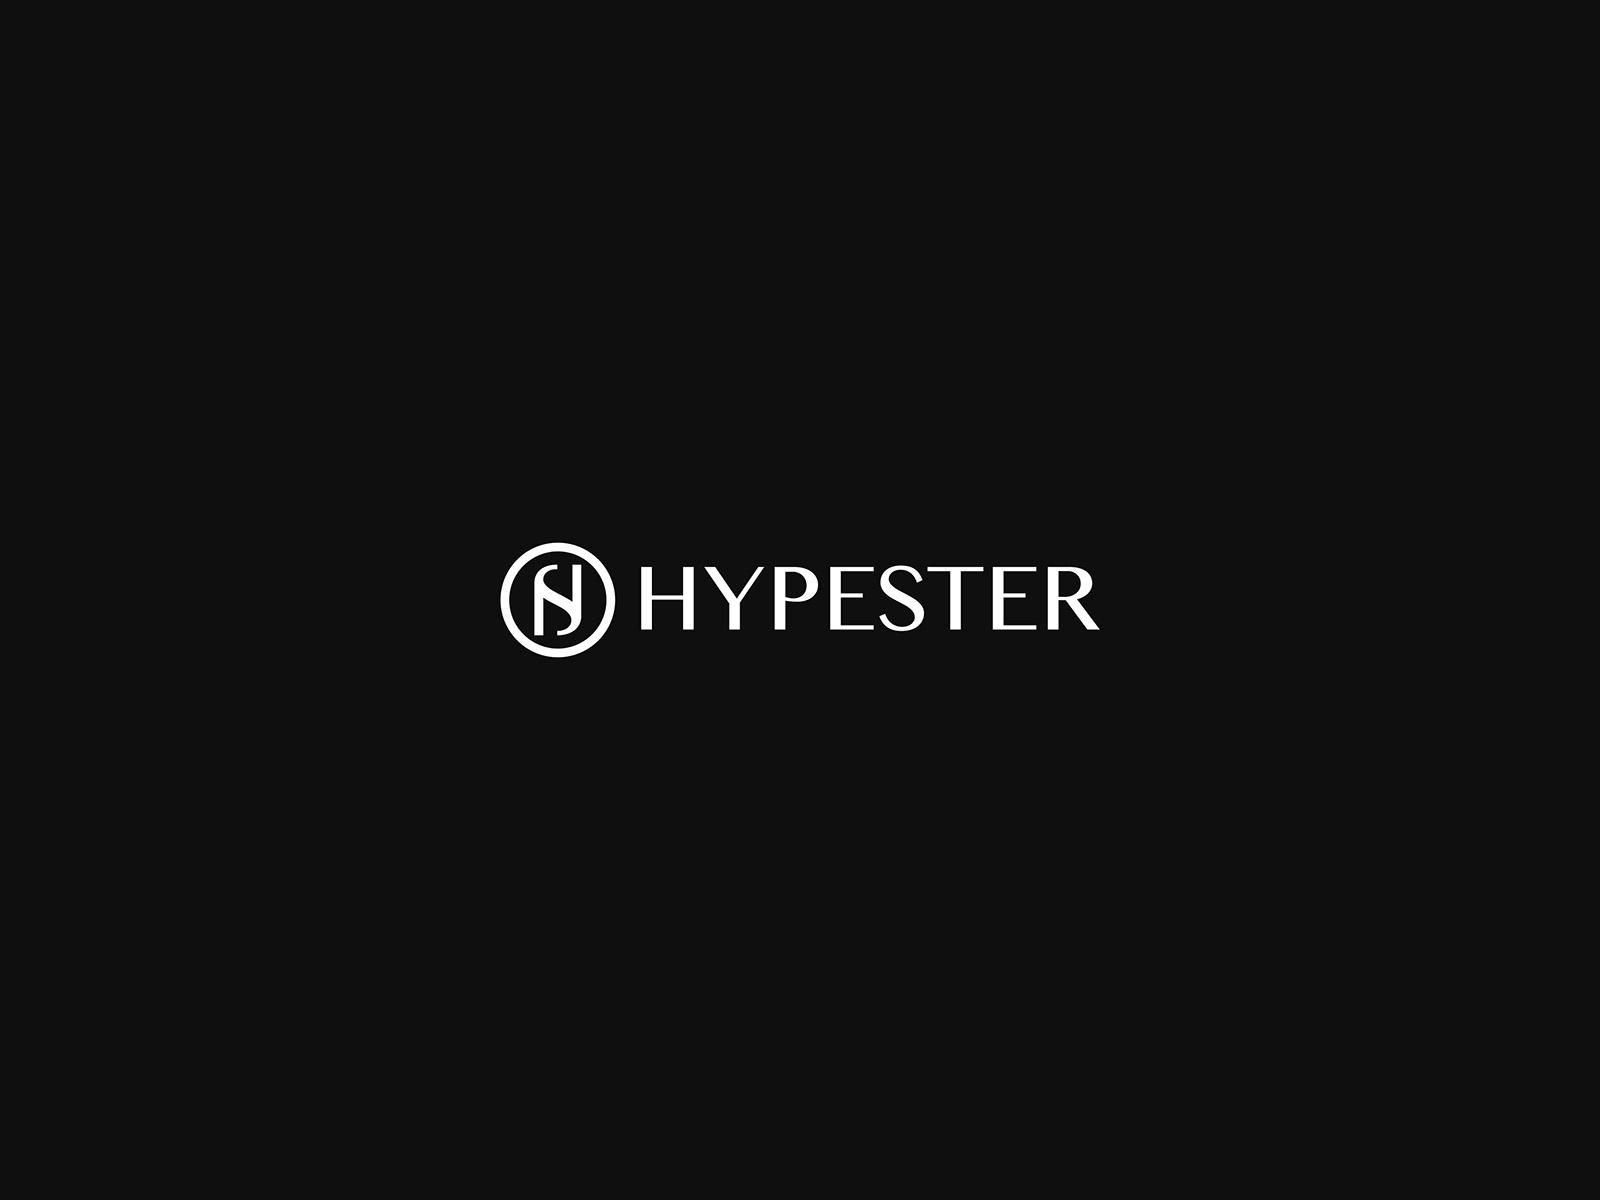 apaper_Hypester_sunglasses_eyewear_1.jpg